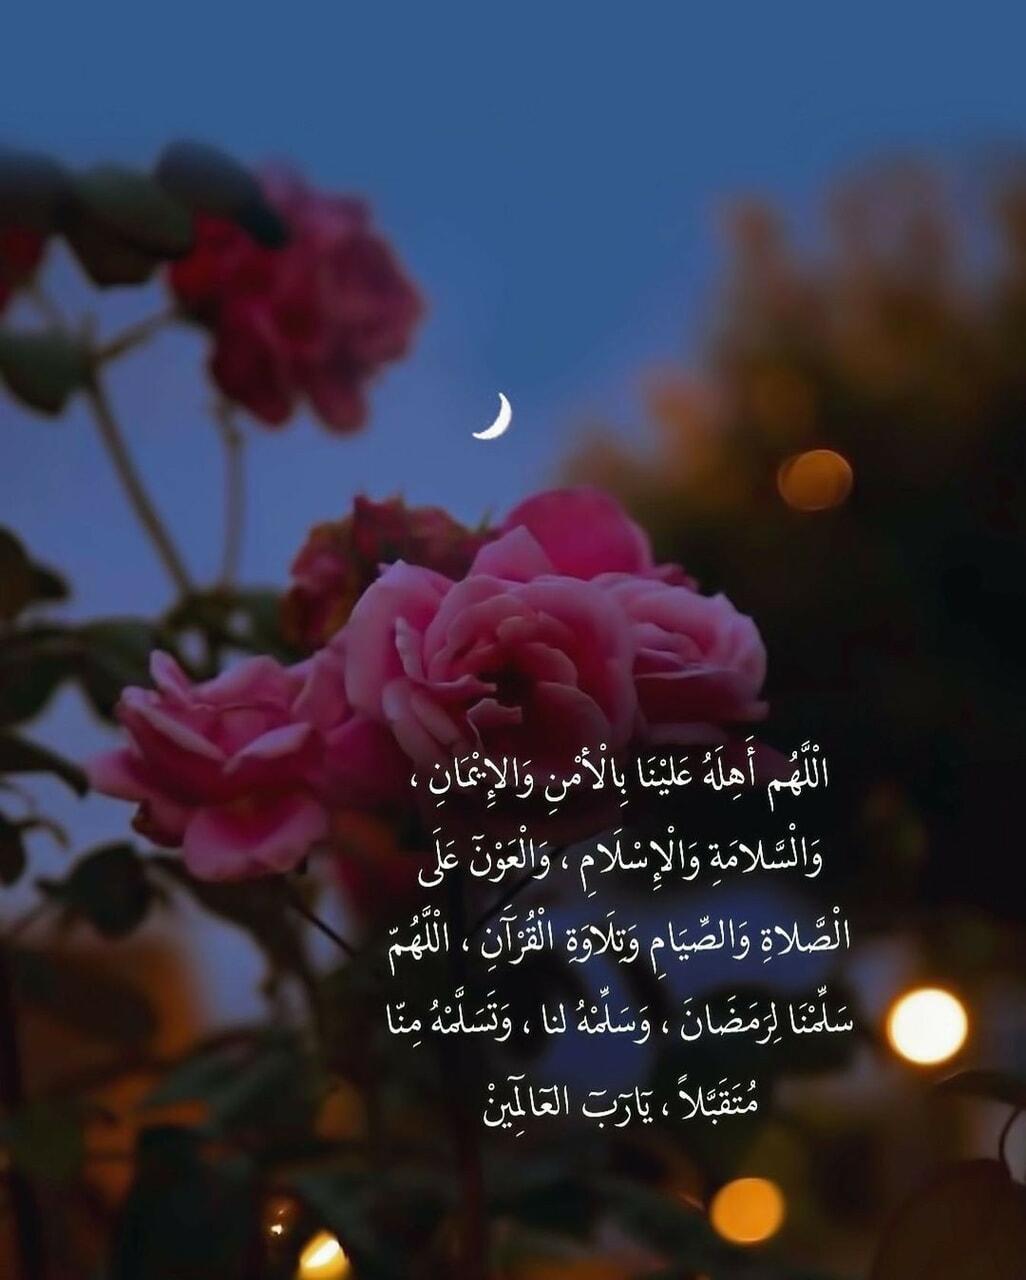 رمضان كريم, قصاصة قصاصات قول اقوال, and خاطرة خواطر مقتبسات image